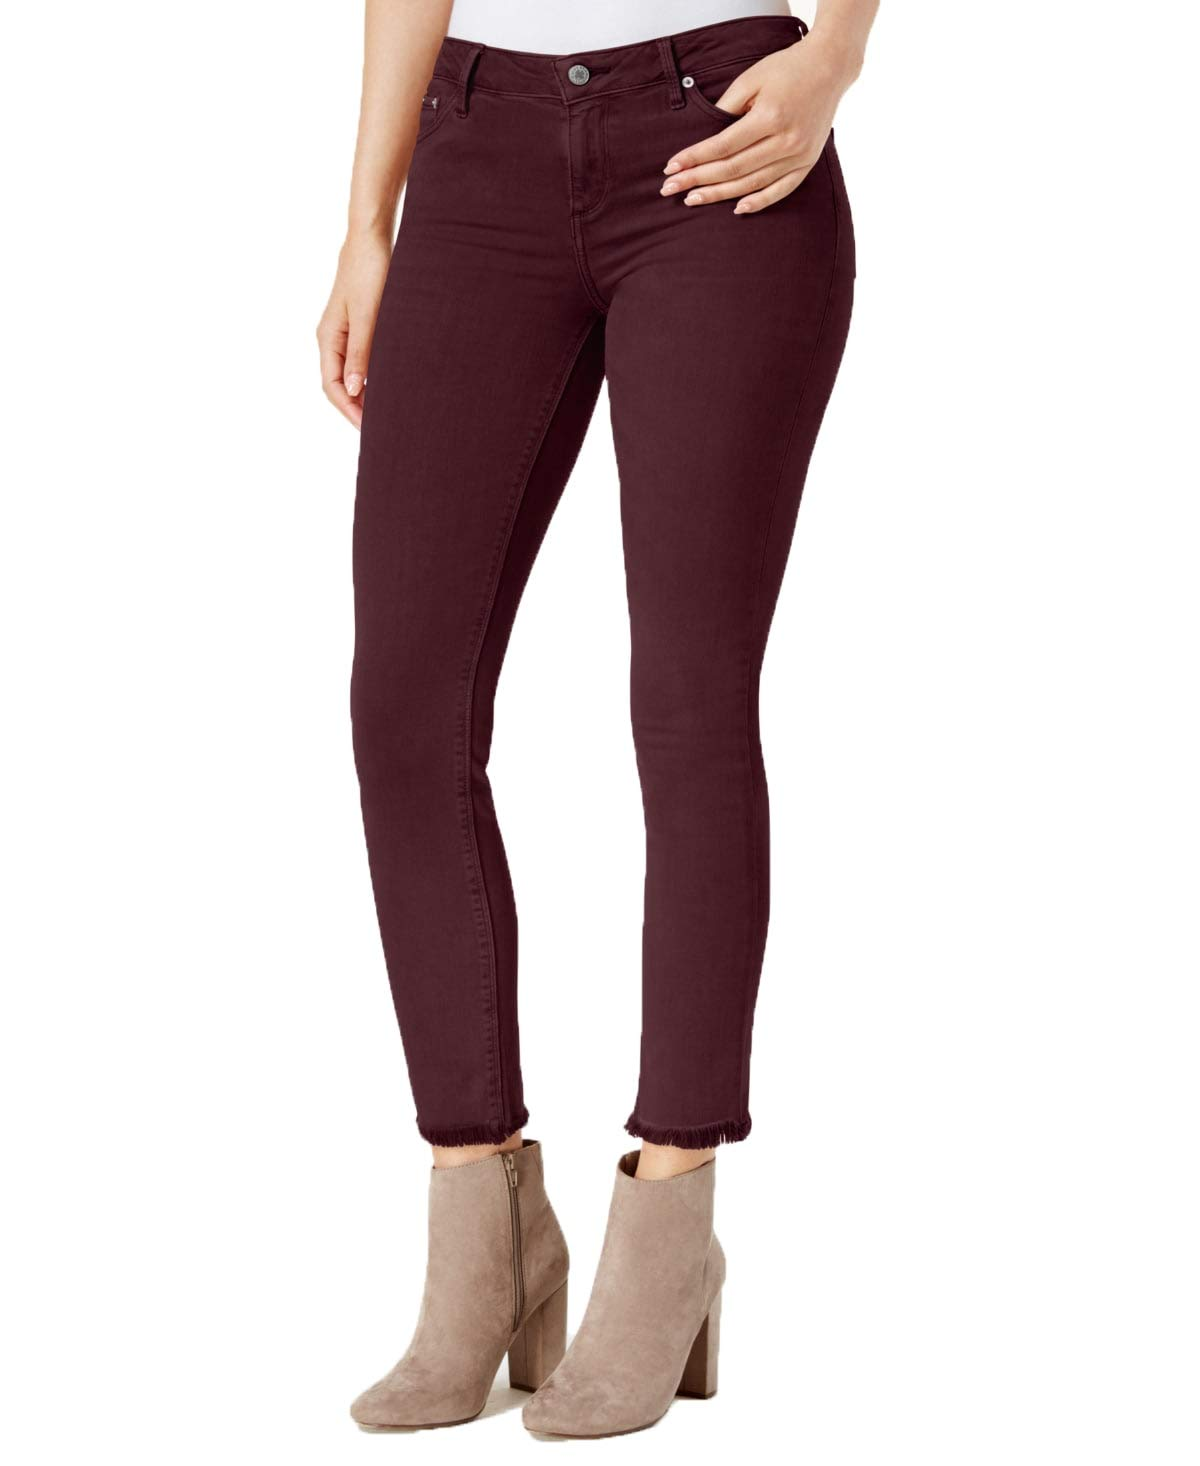 Womens Stretch Lolita Fray Skinny Jeans 0